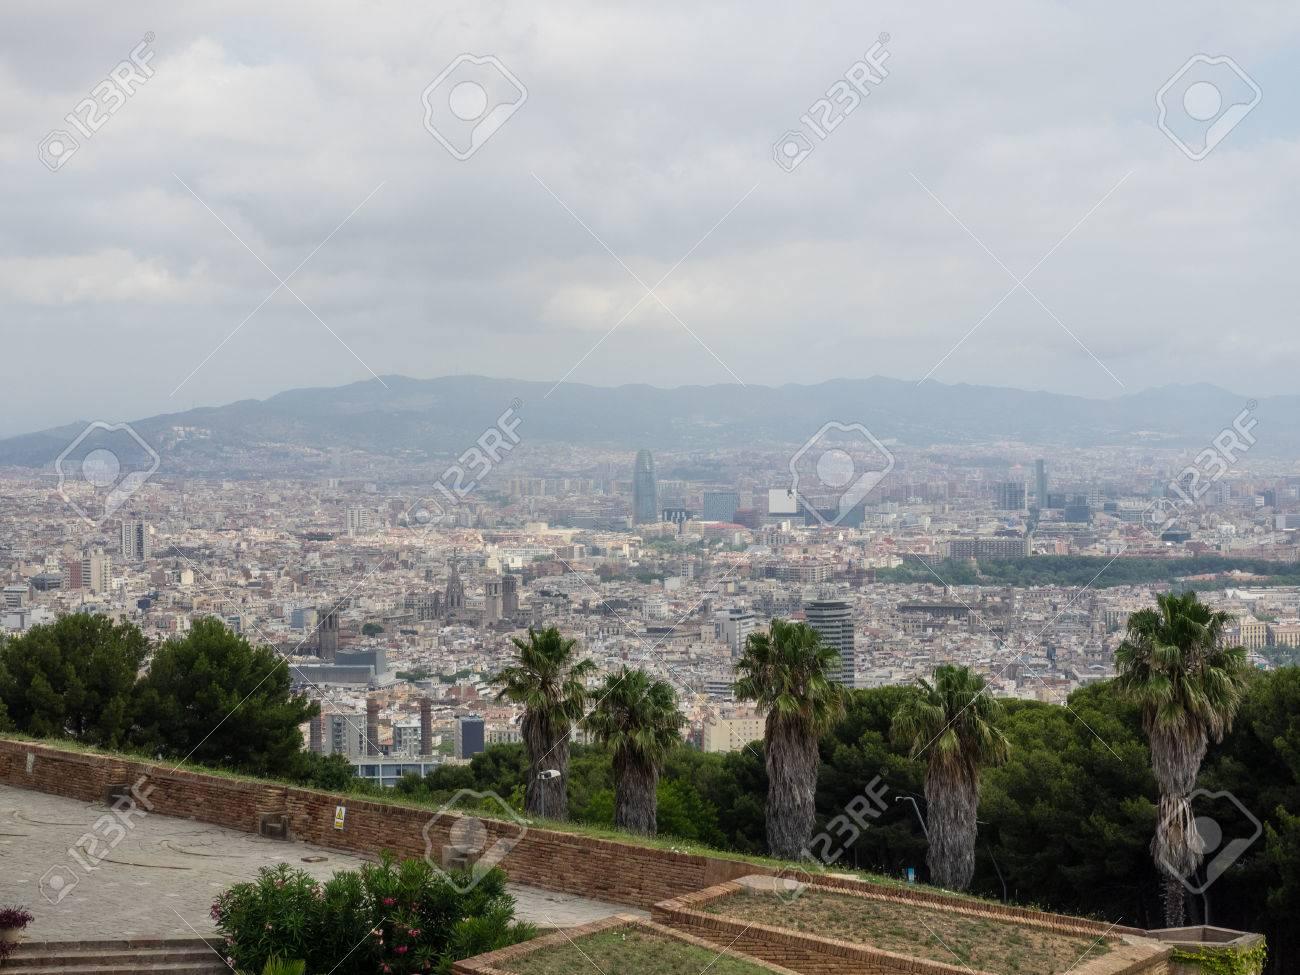 Wonderful Montjuïc Castle Is An Old Military Fortress Built On Top Of Montjuïc